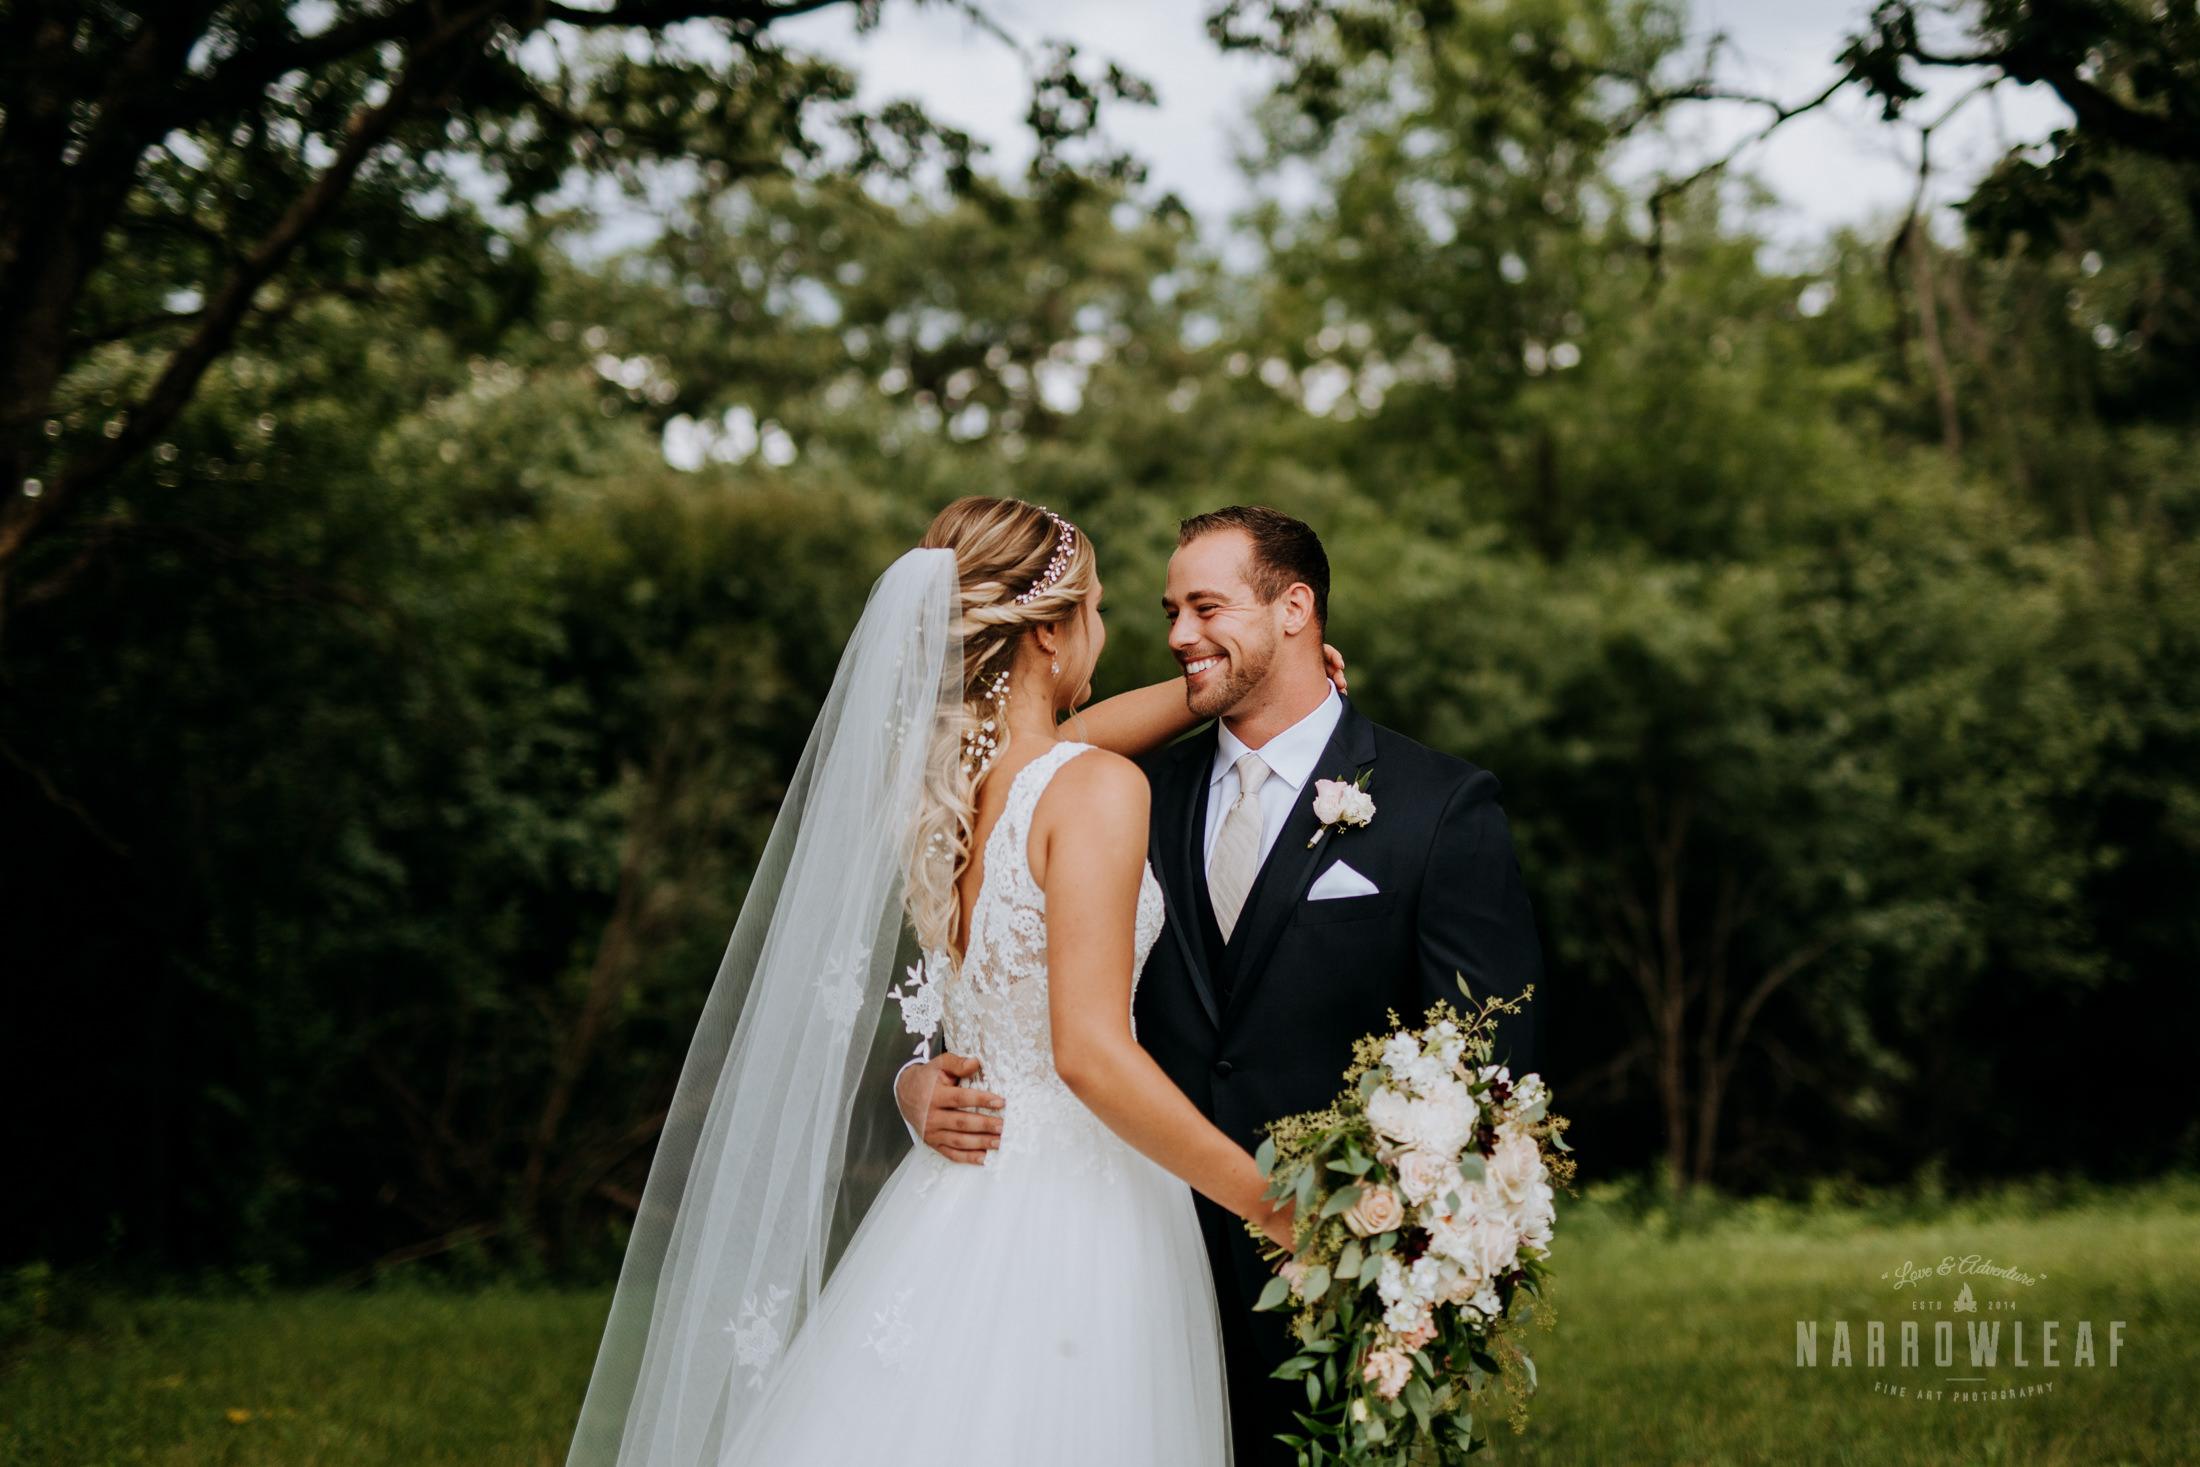 John-P-Furber-Farm-Minnesota-wedding-photographer-Narrowleaf_Love_and_Adventure_Photography-7105.jpg